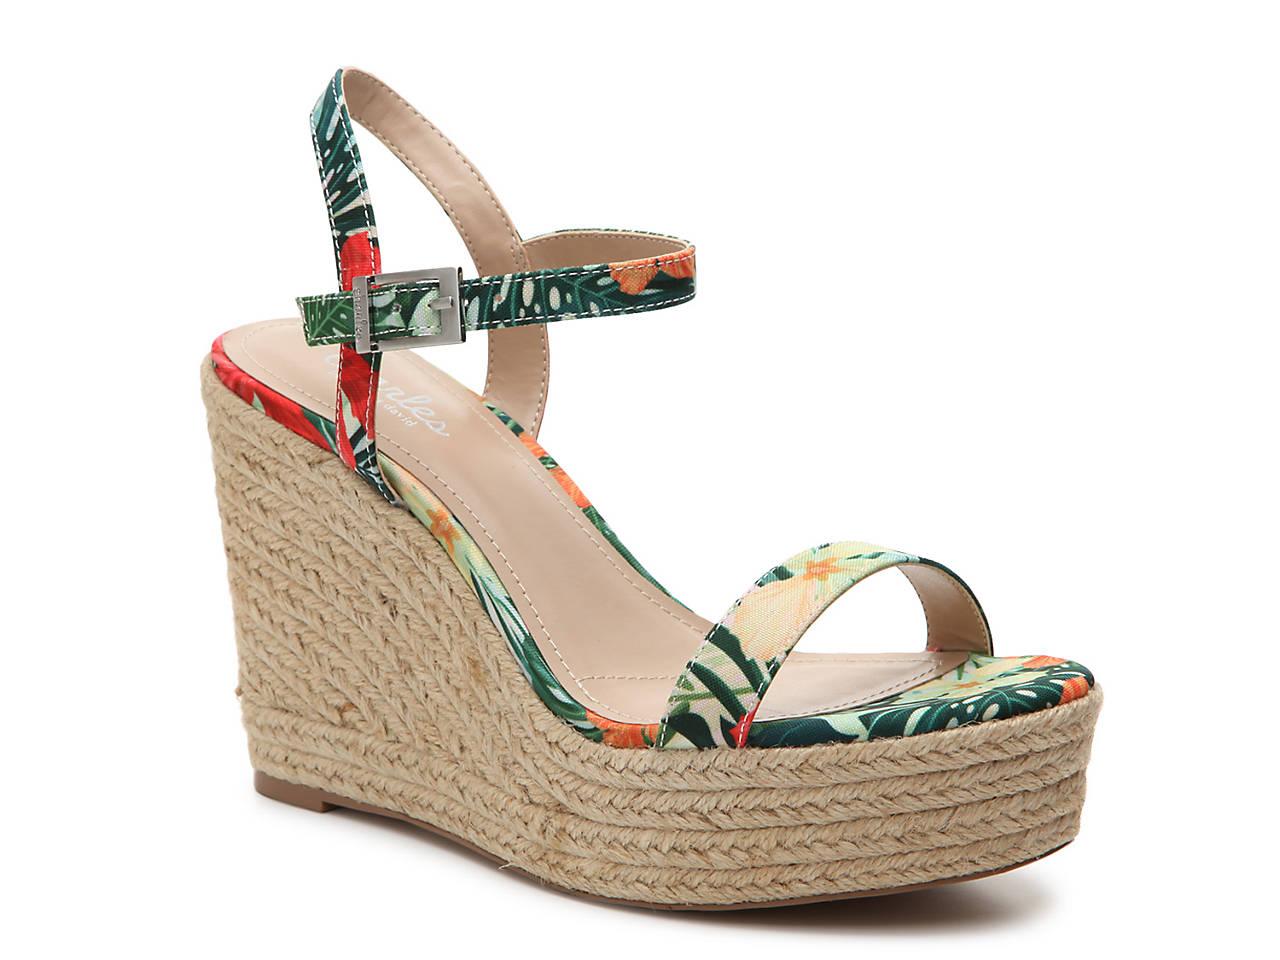 e27b2f78c Charles by Charles David Lizzie Wedge Sandal Women s Shoes